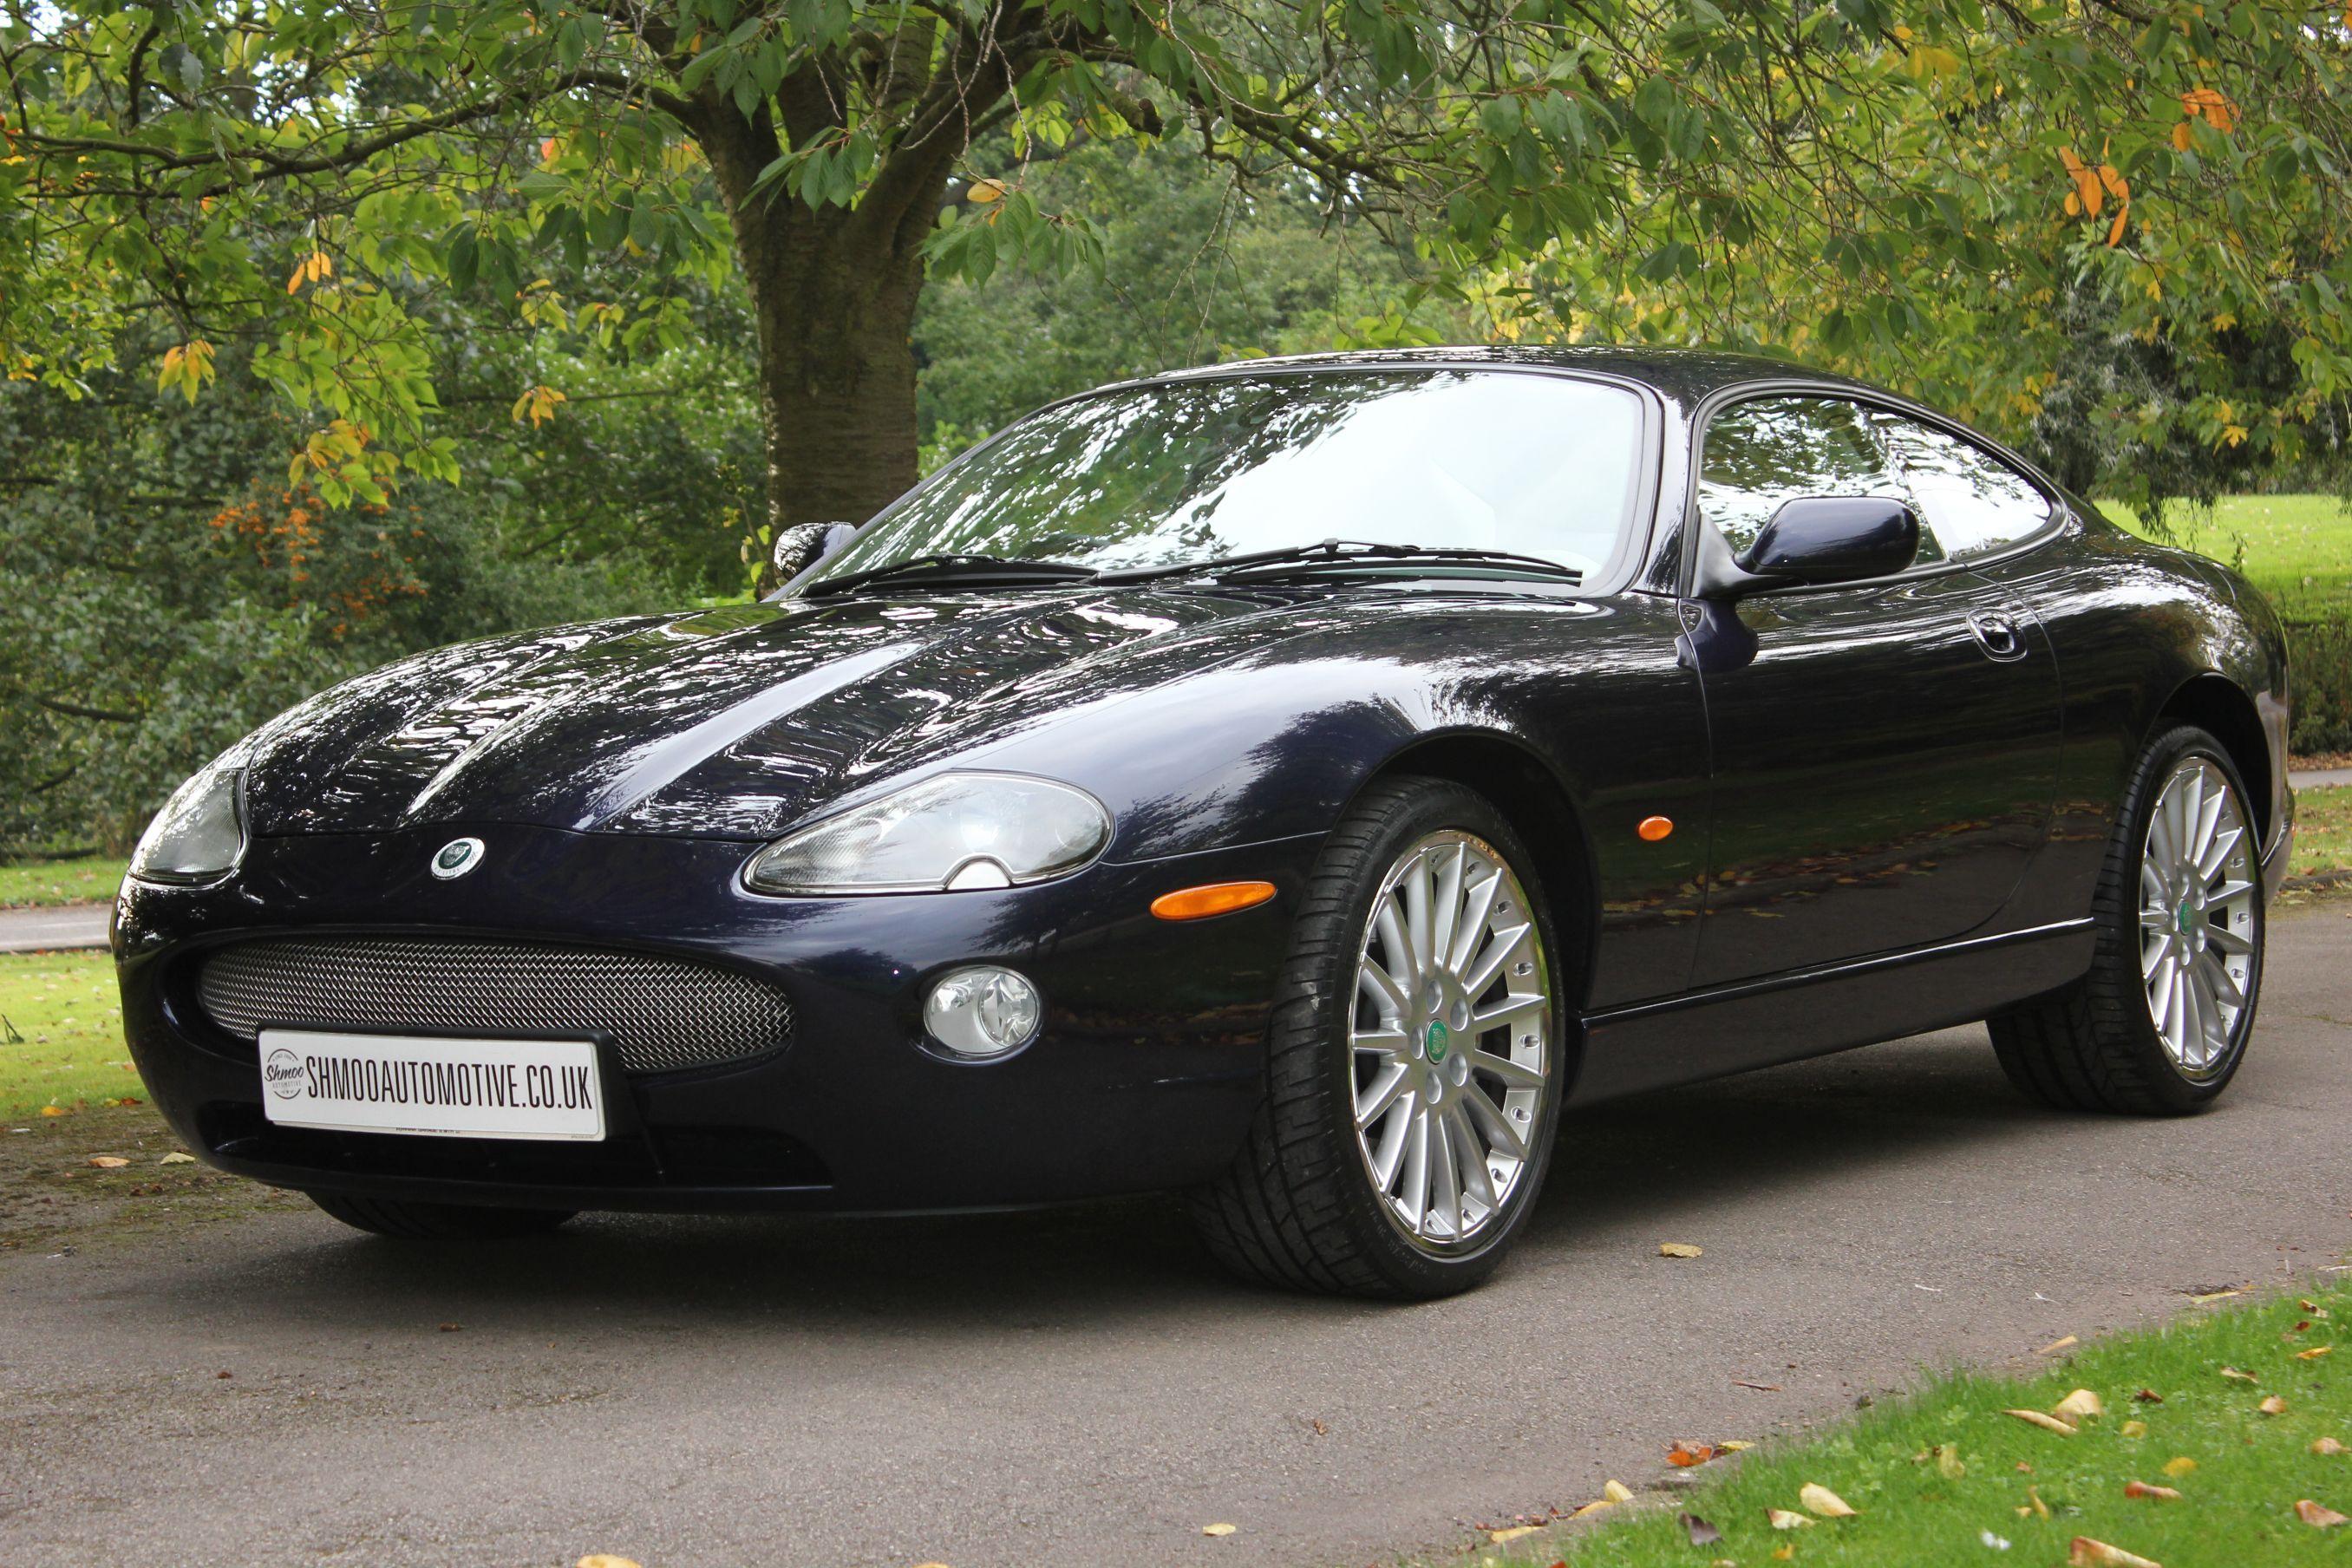 for now fjsh type coupe xkr stock cars s donington miles will buy xj jaguar sold silver xjs performancejaguar